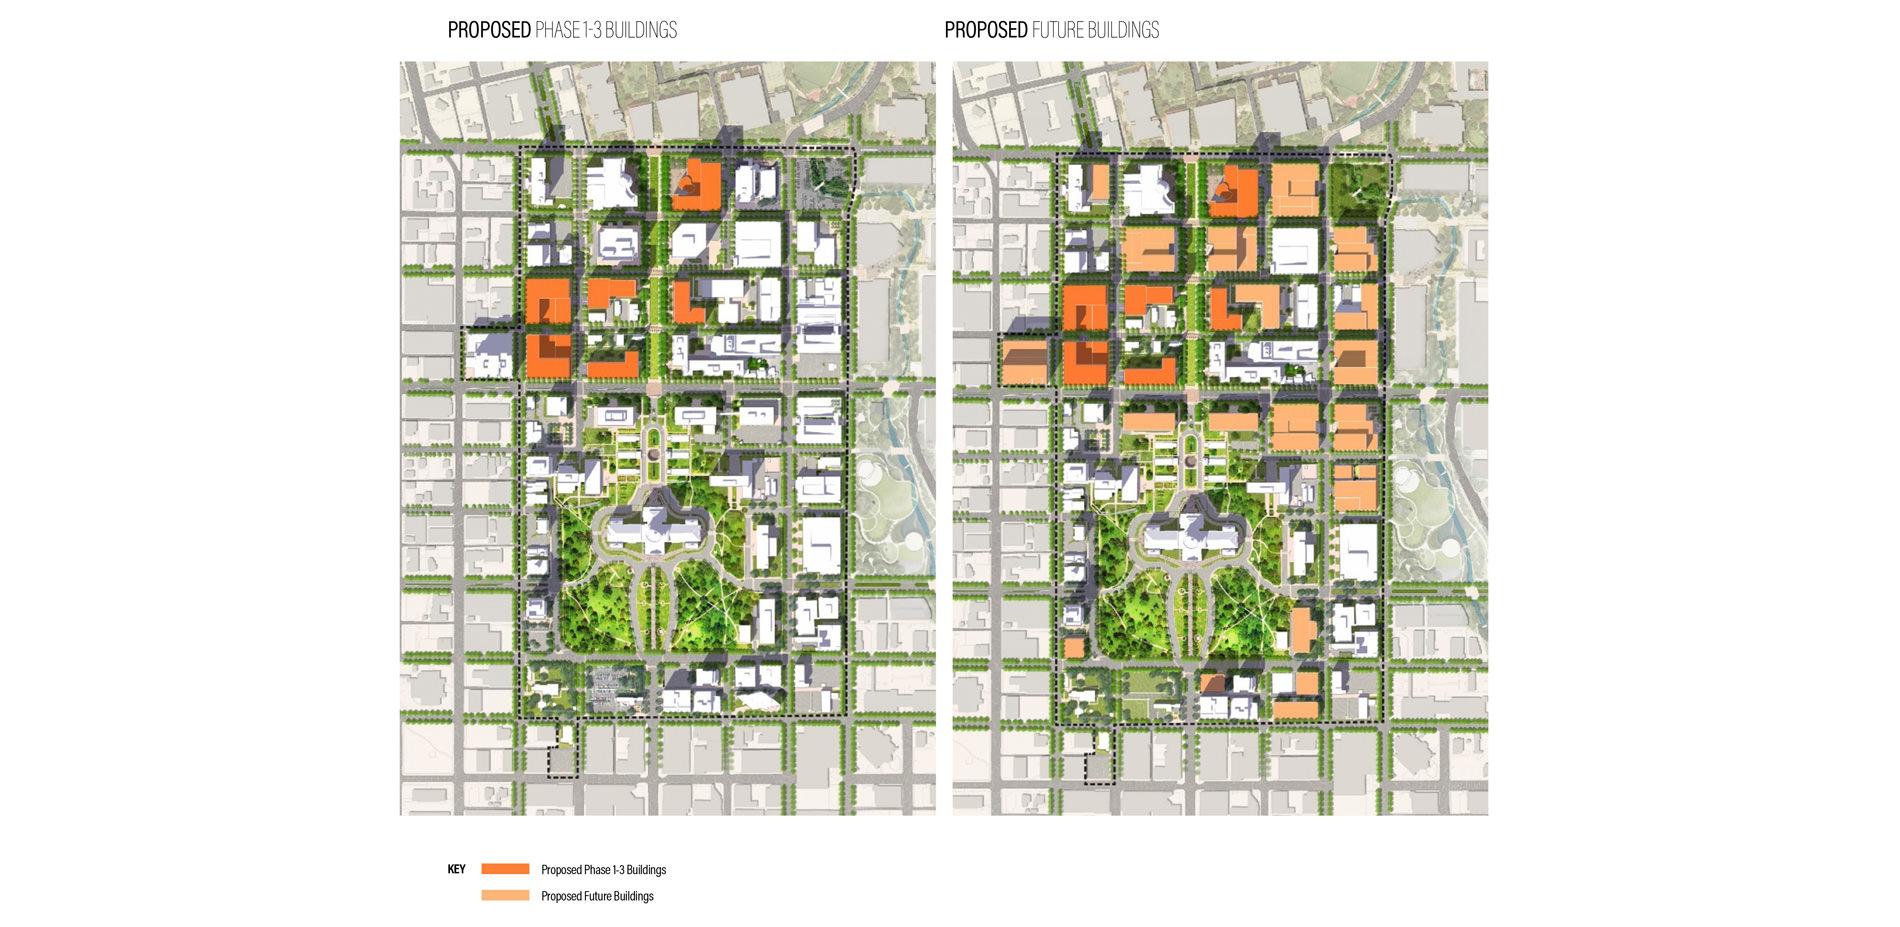 Map Of Texas Capitol.Texas Capitol Complex Master Plan 2017 Asla Professional Awards